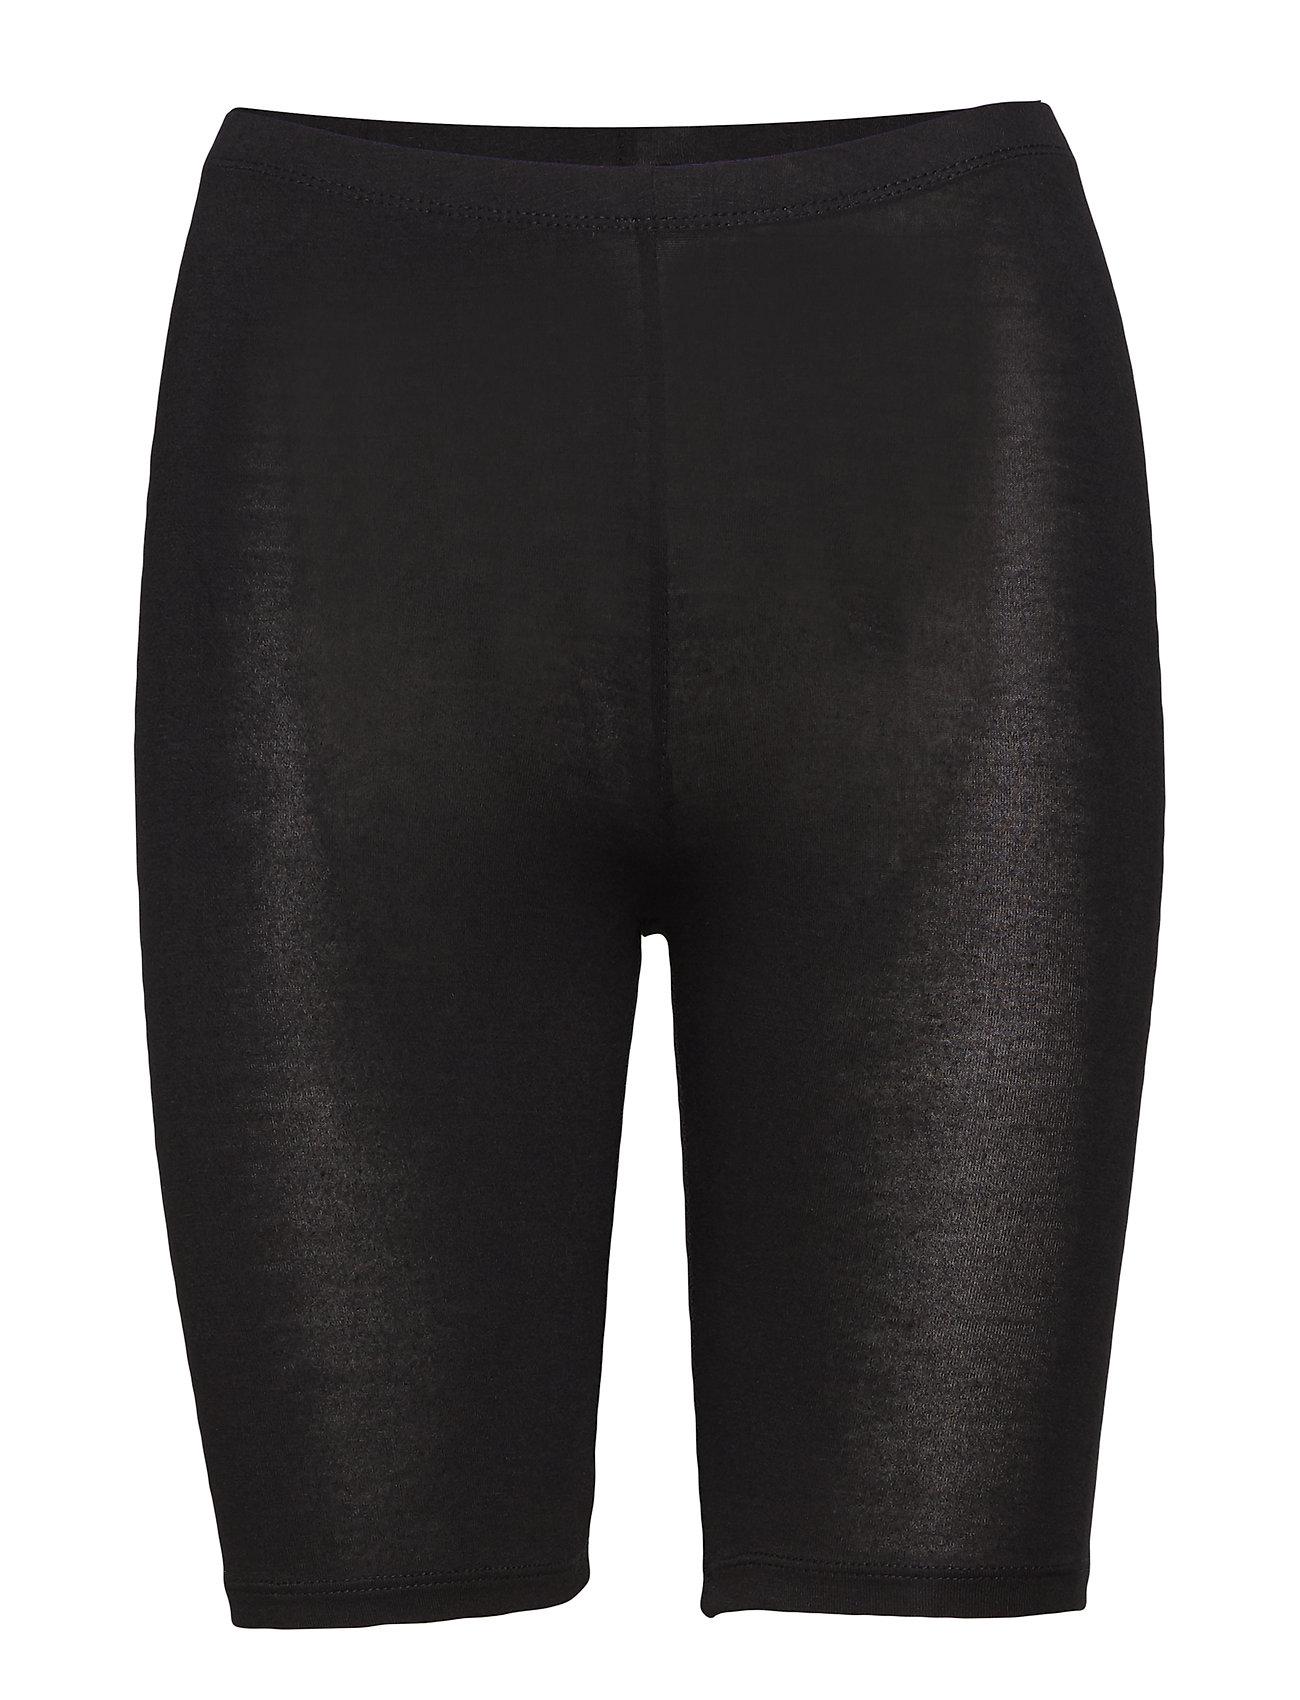 Decoy DECOY shorts viscose stretch - BLACK